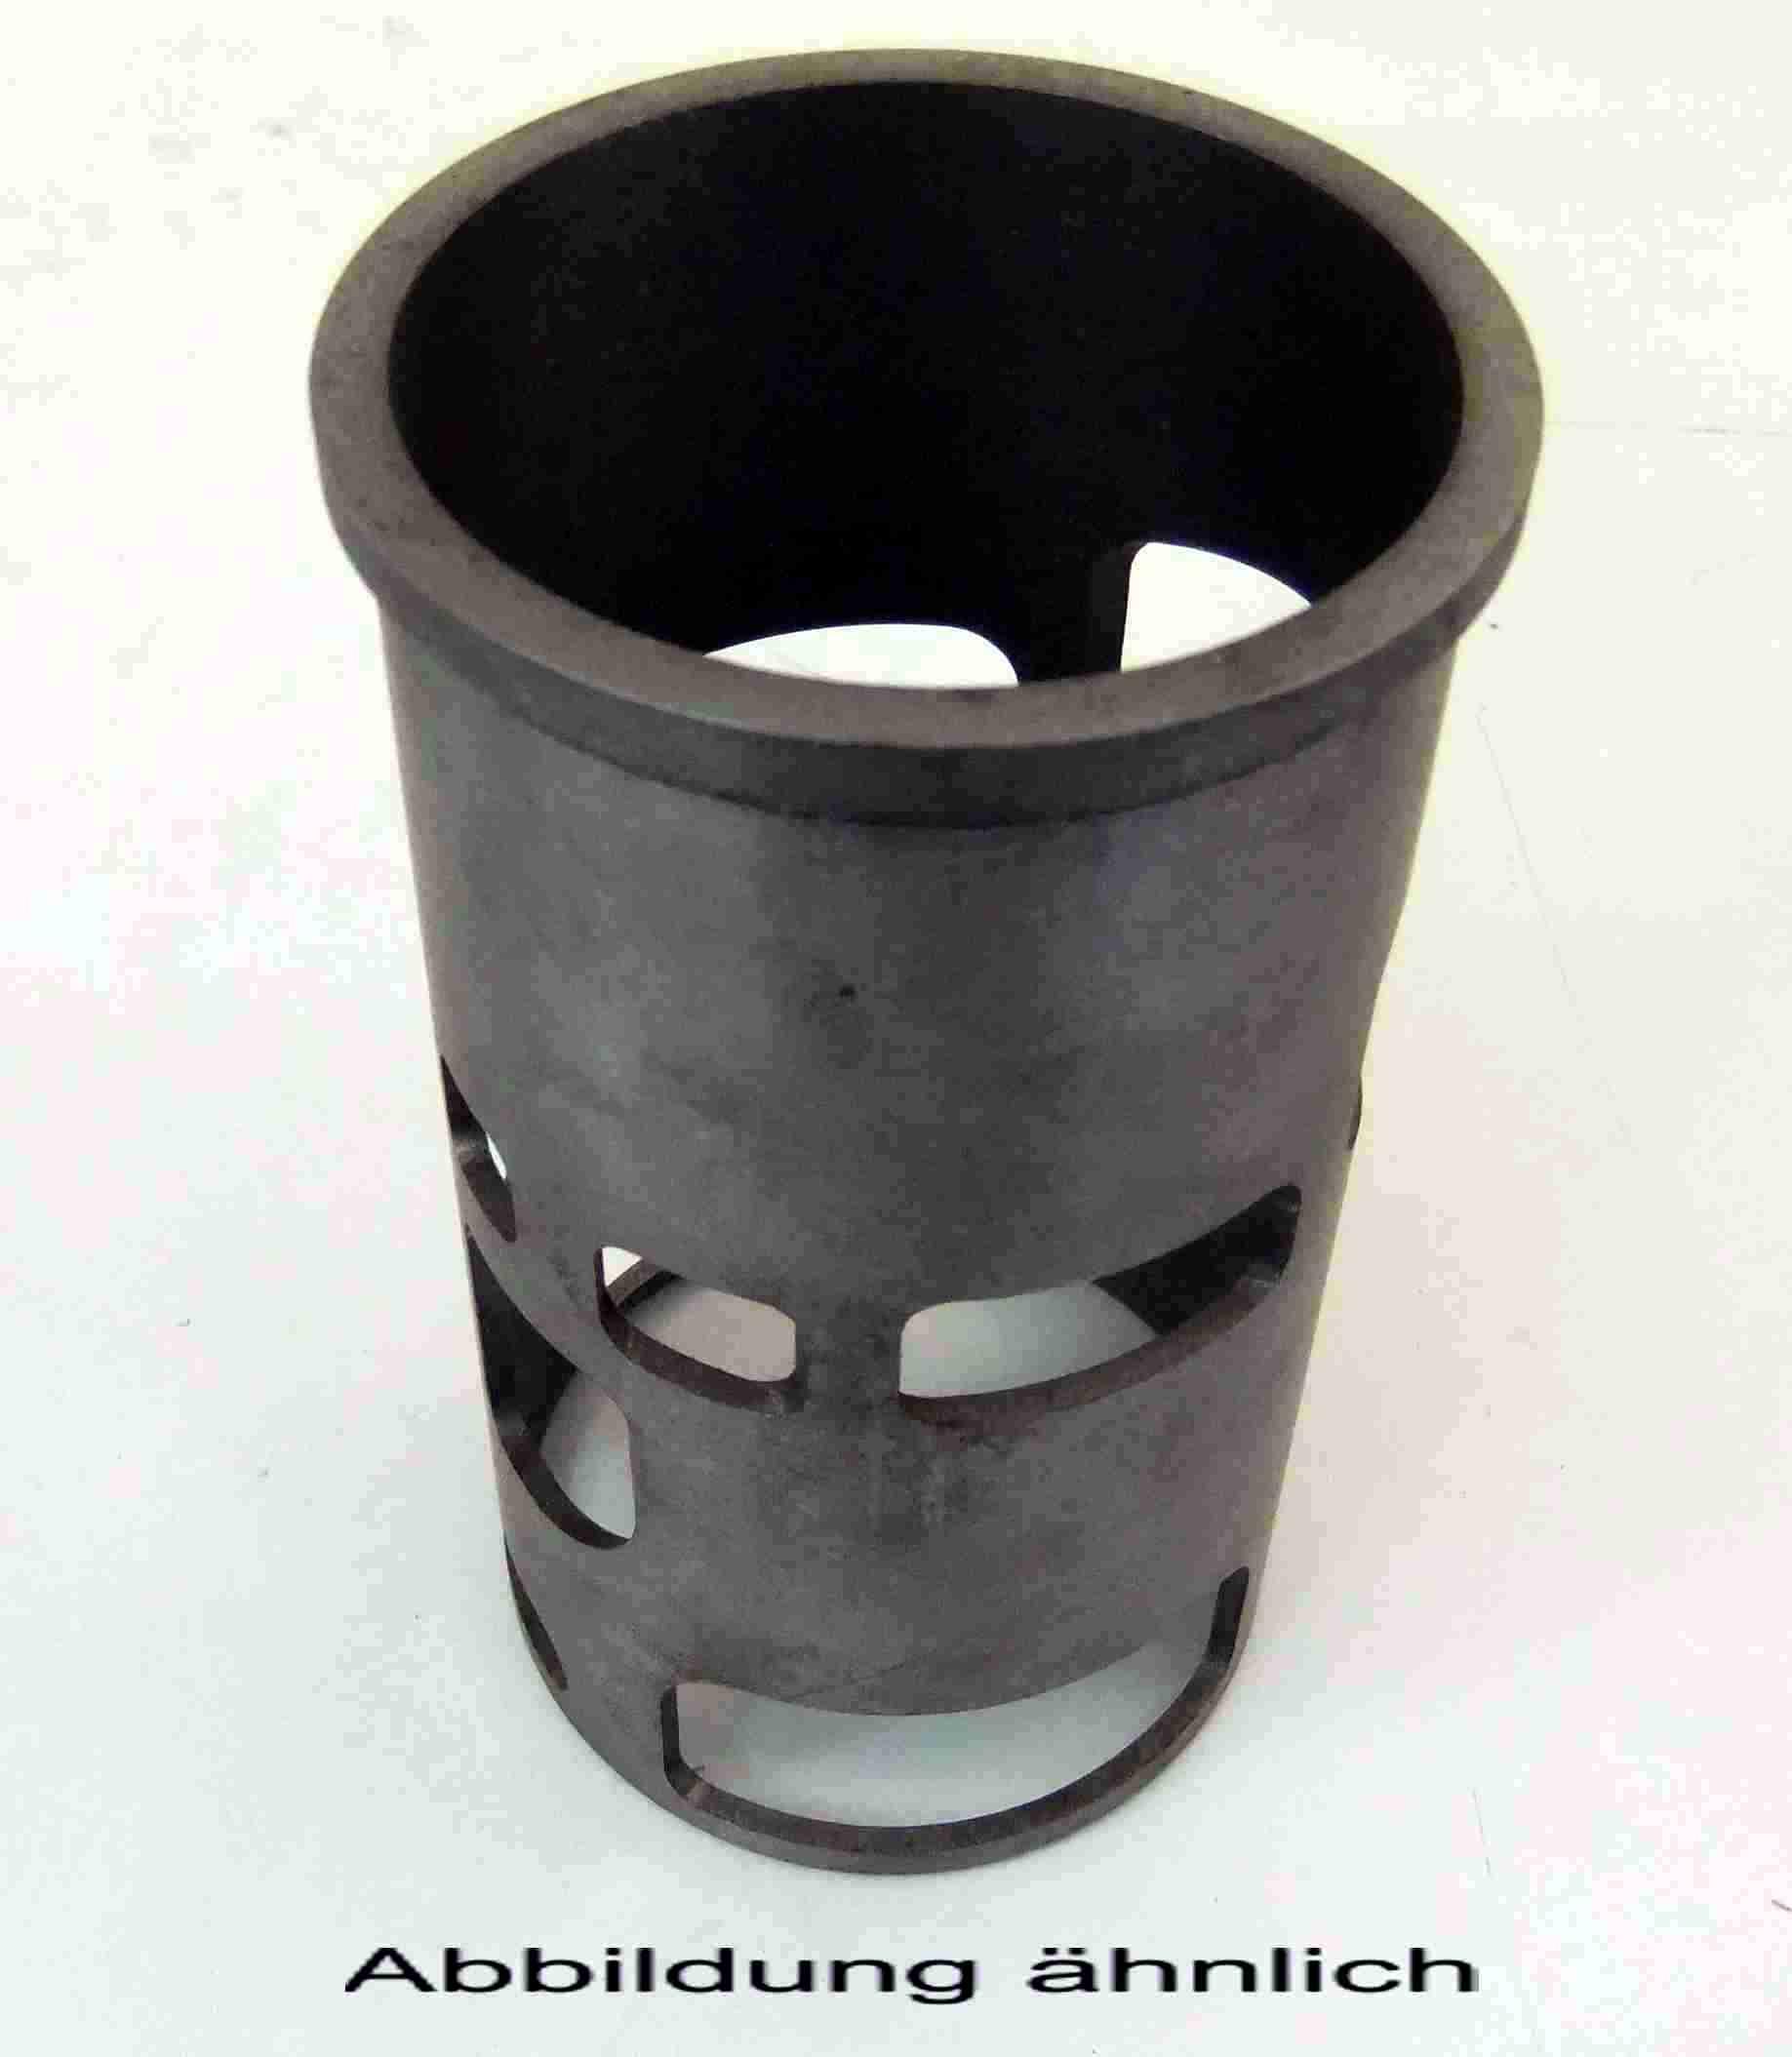 schrems zylinder laufbuchse aus spezial stahl guss mm schrems racing parts. Black Bedroom Furniture Sets. Home Design Ideas